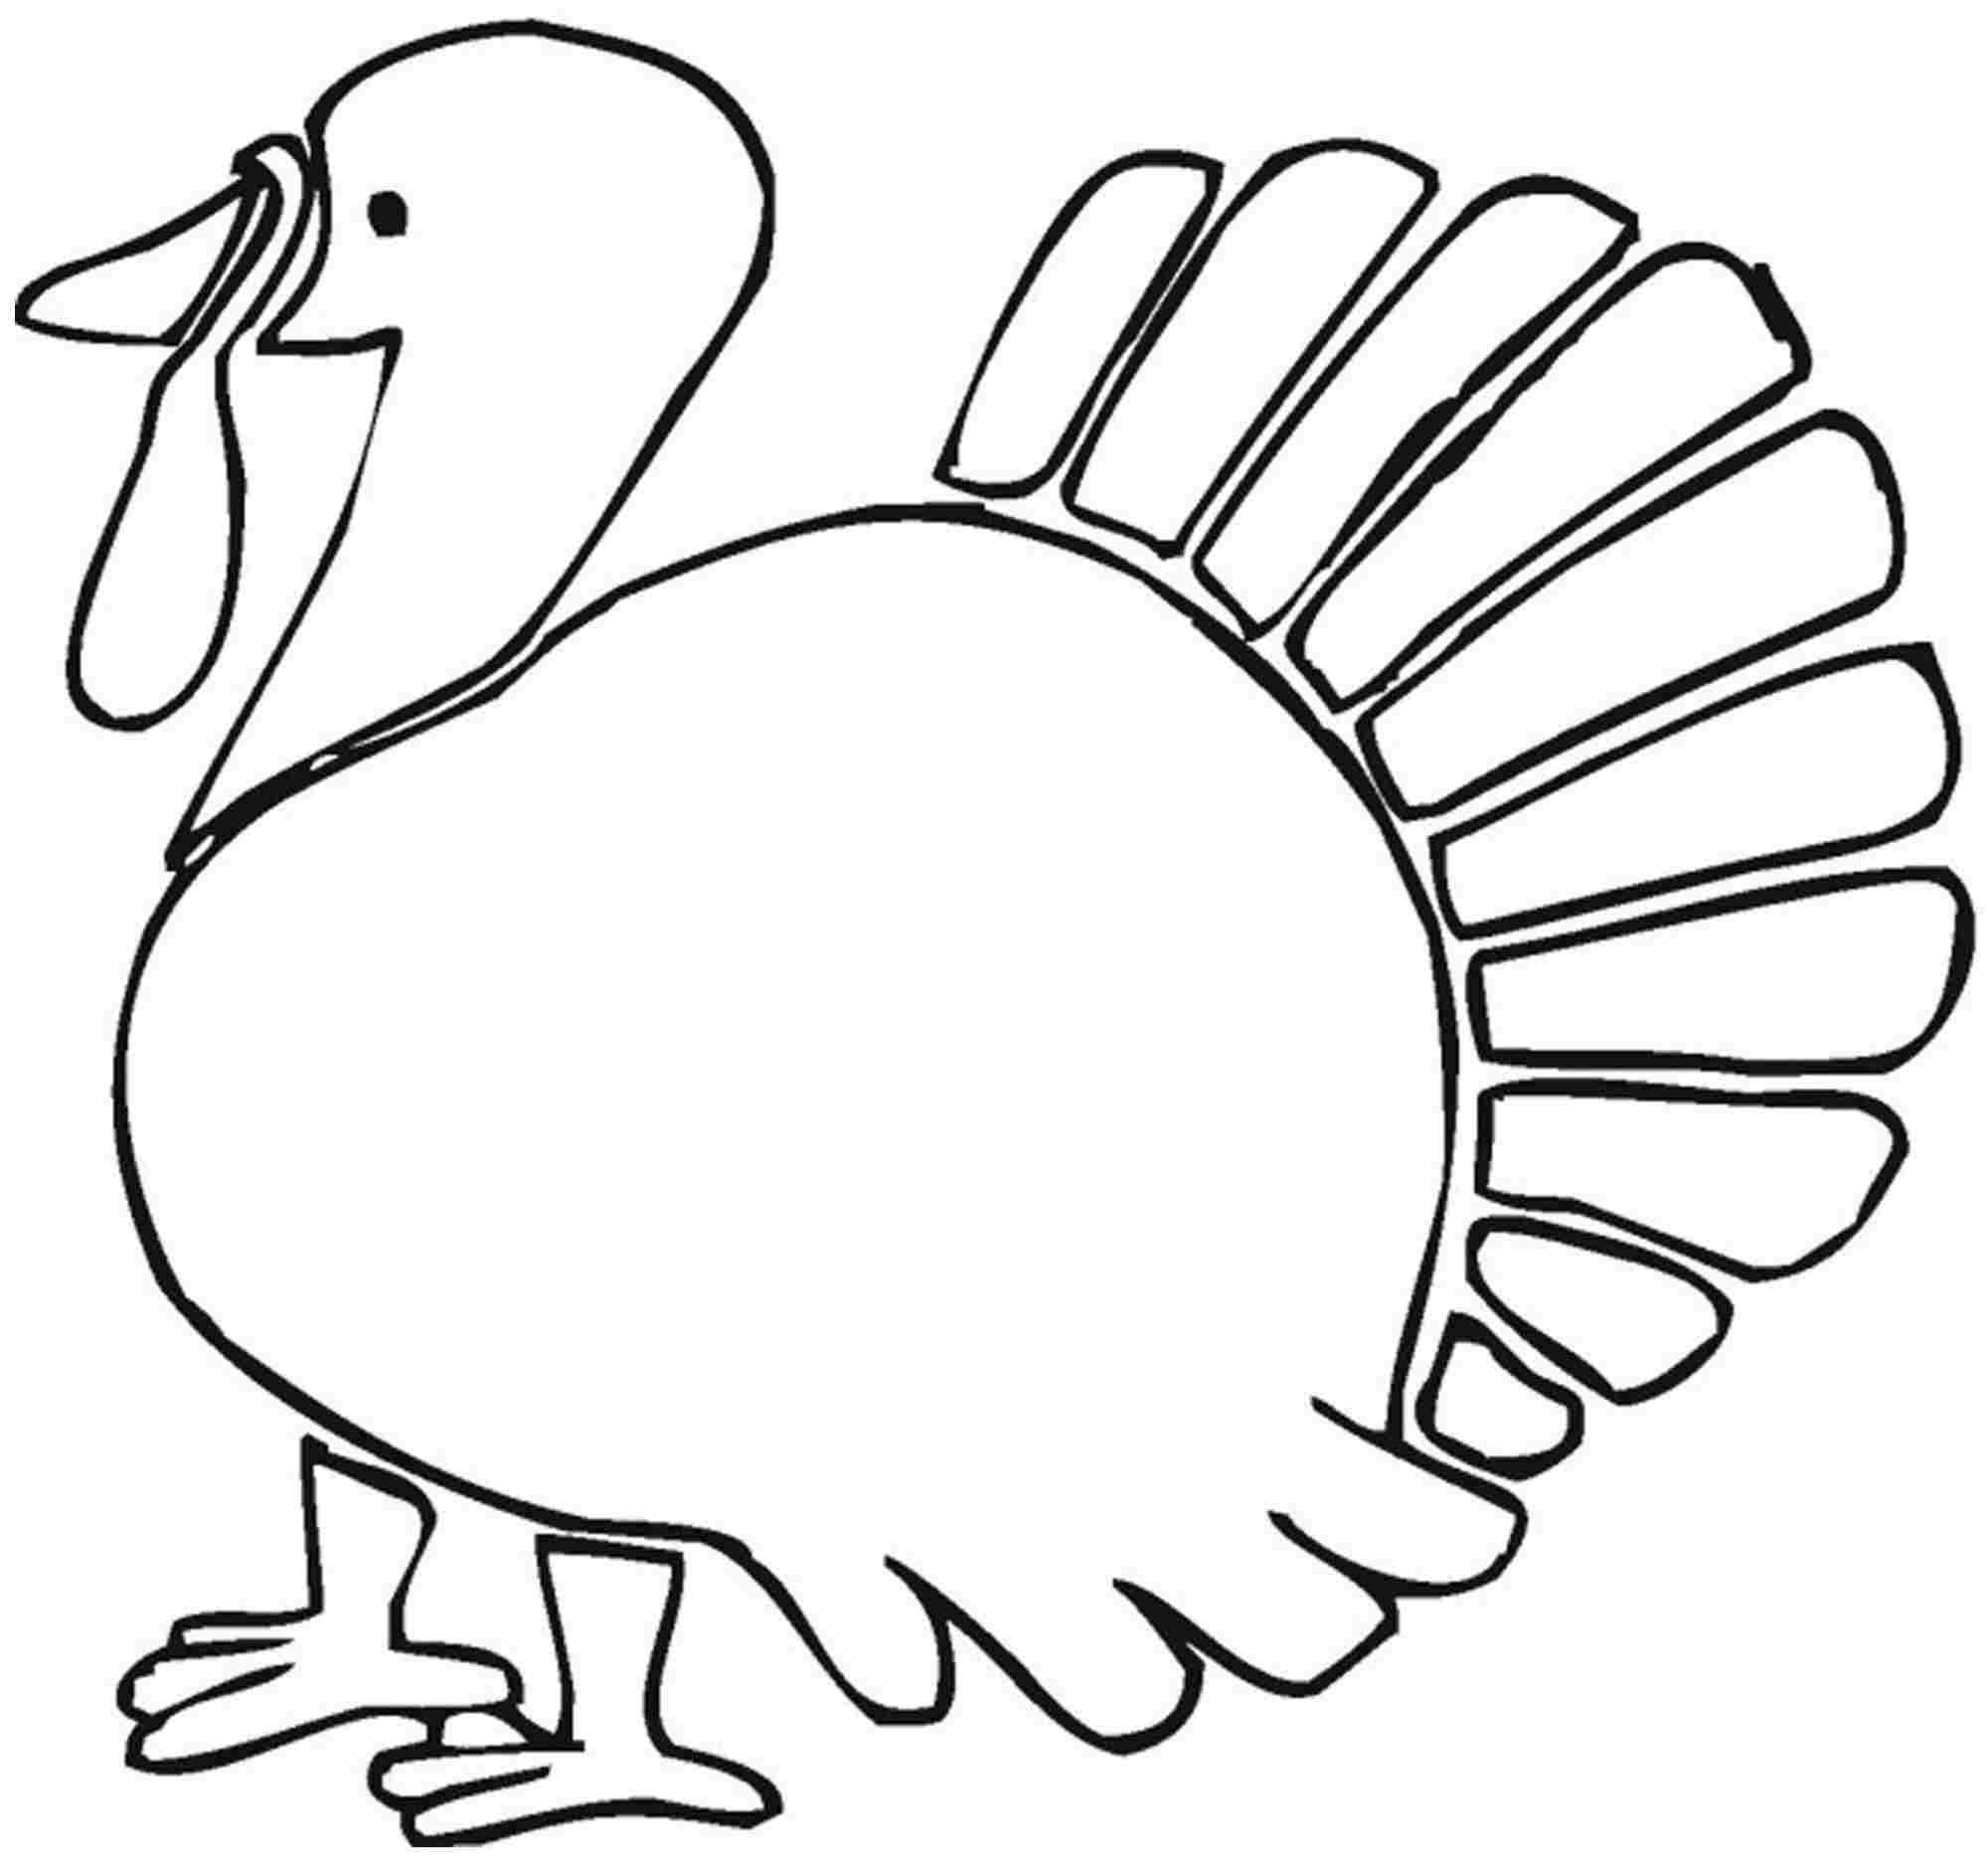 preschool turkey coloring pages - photo#25